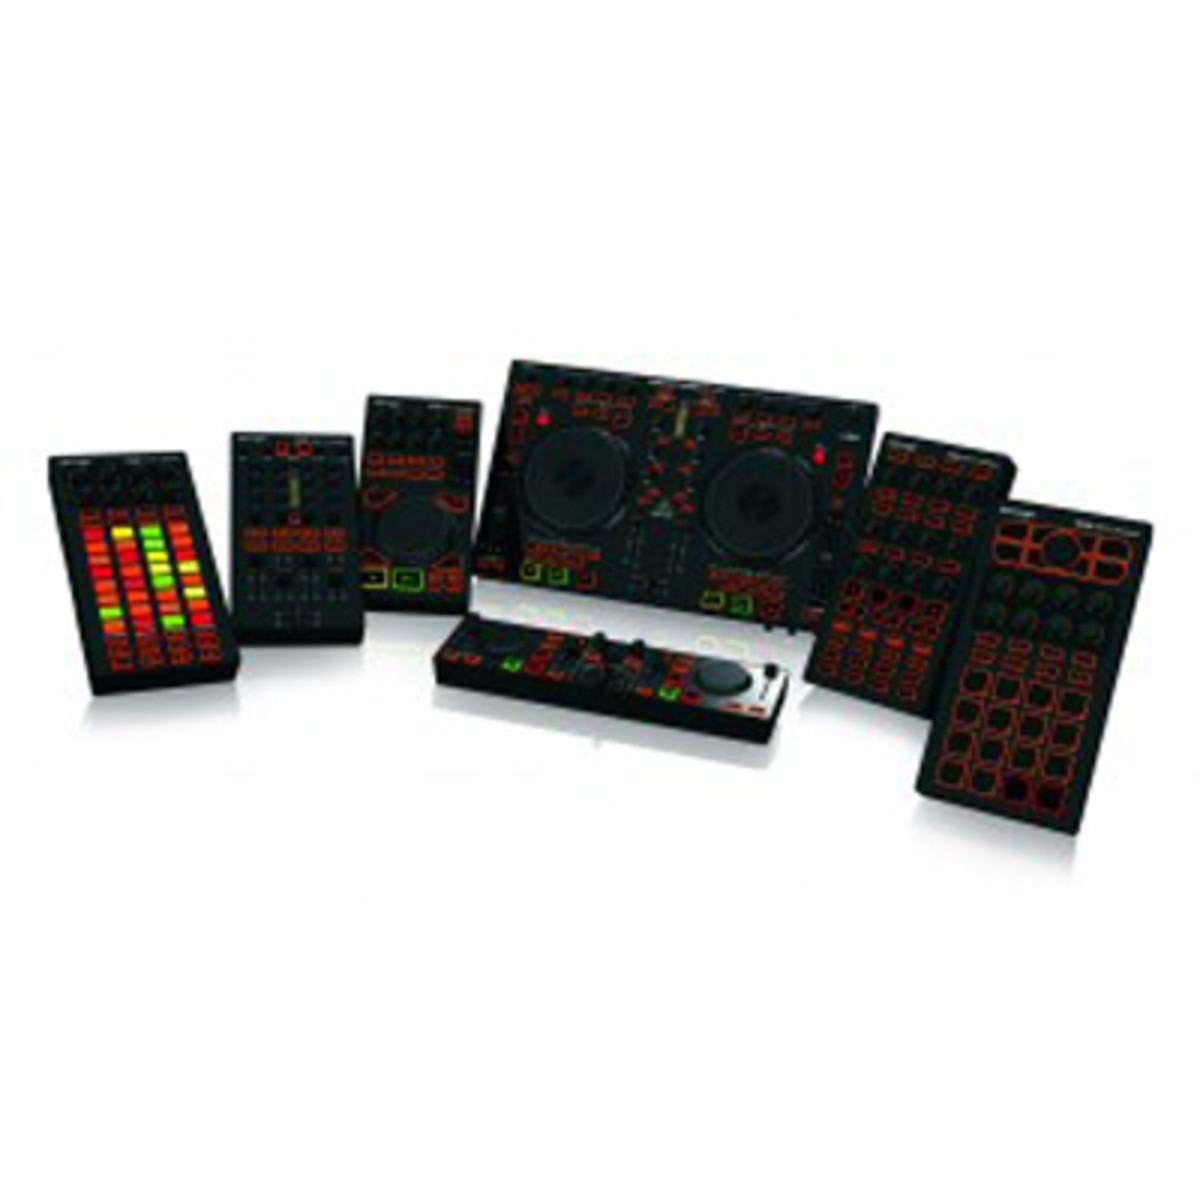 behringercontrollers.jpg